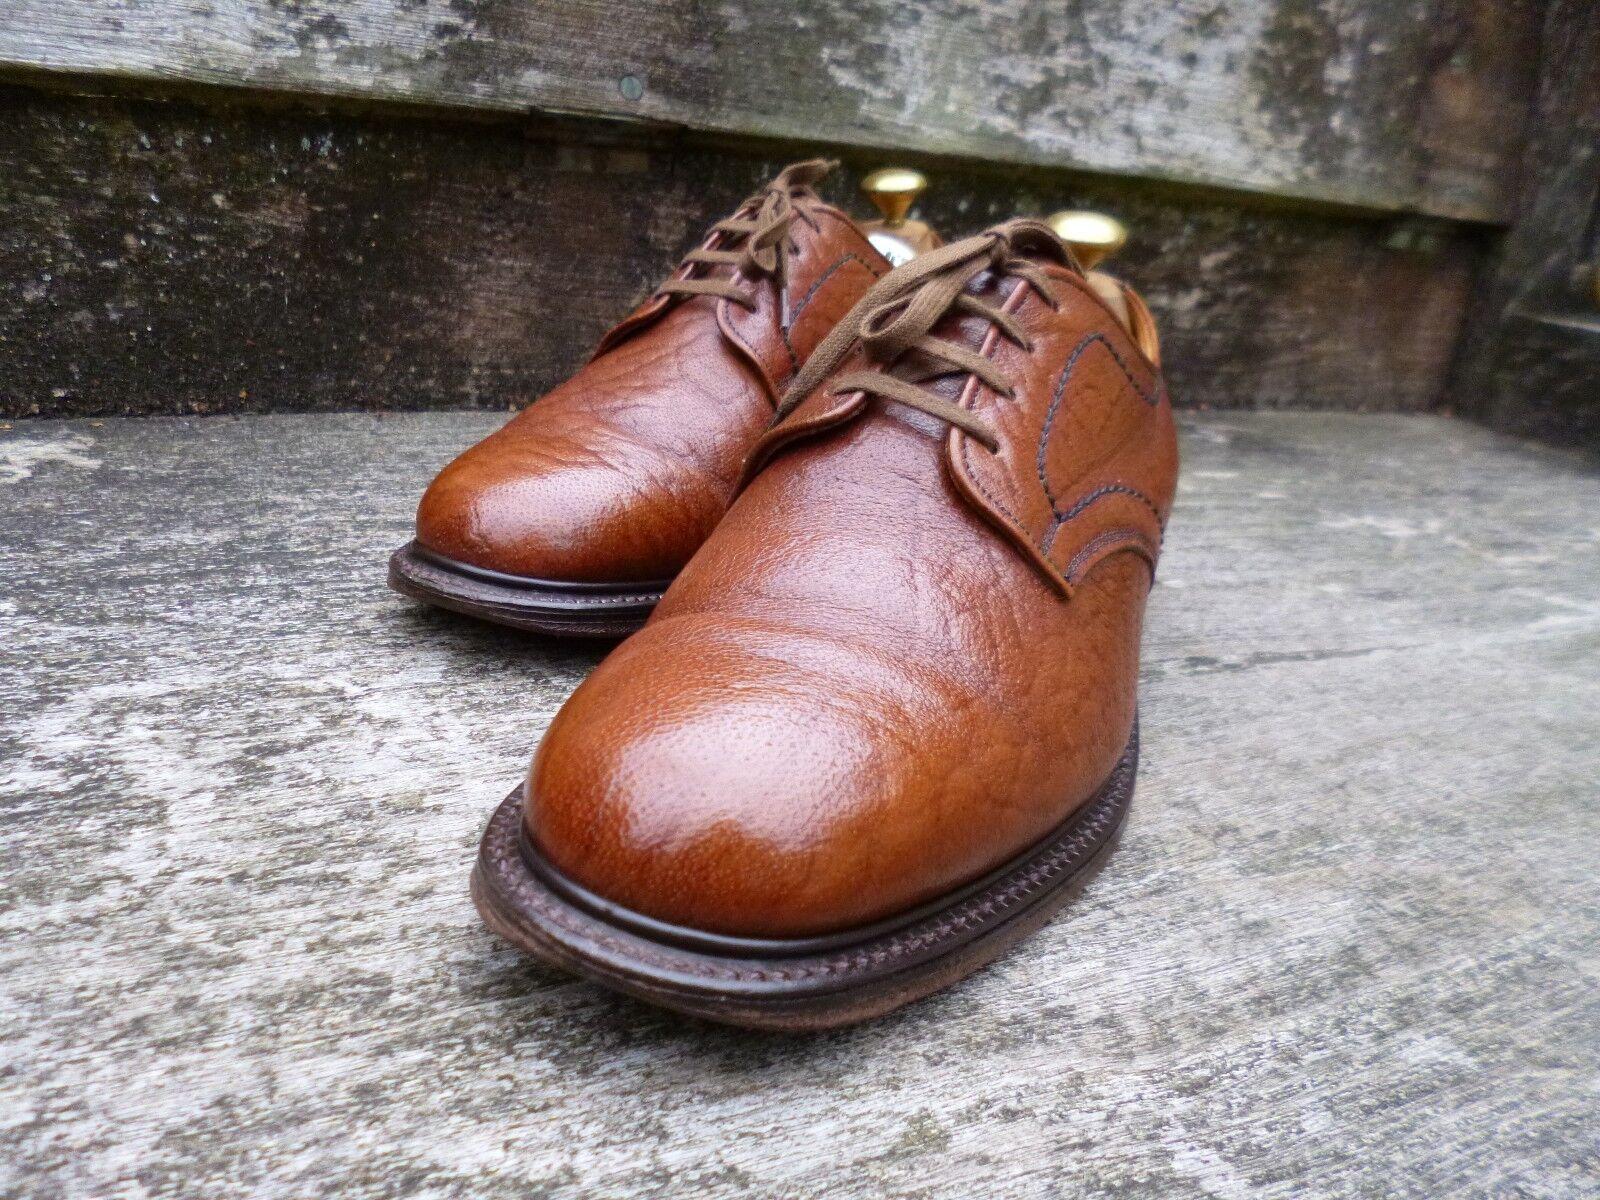 CHEANEY/church derby Vintage-Marrone/Tan-– Ottime Ottime Ottime condizioni bd77af